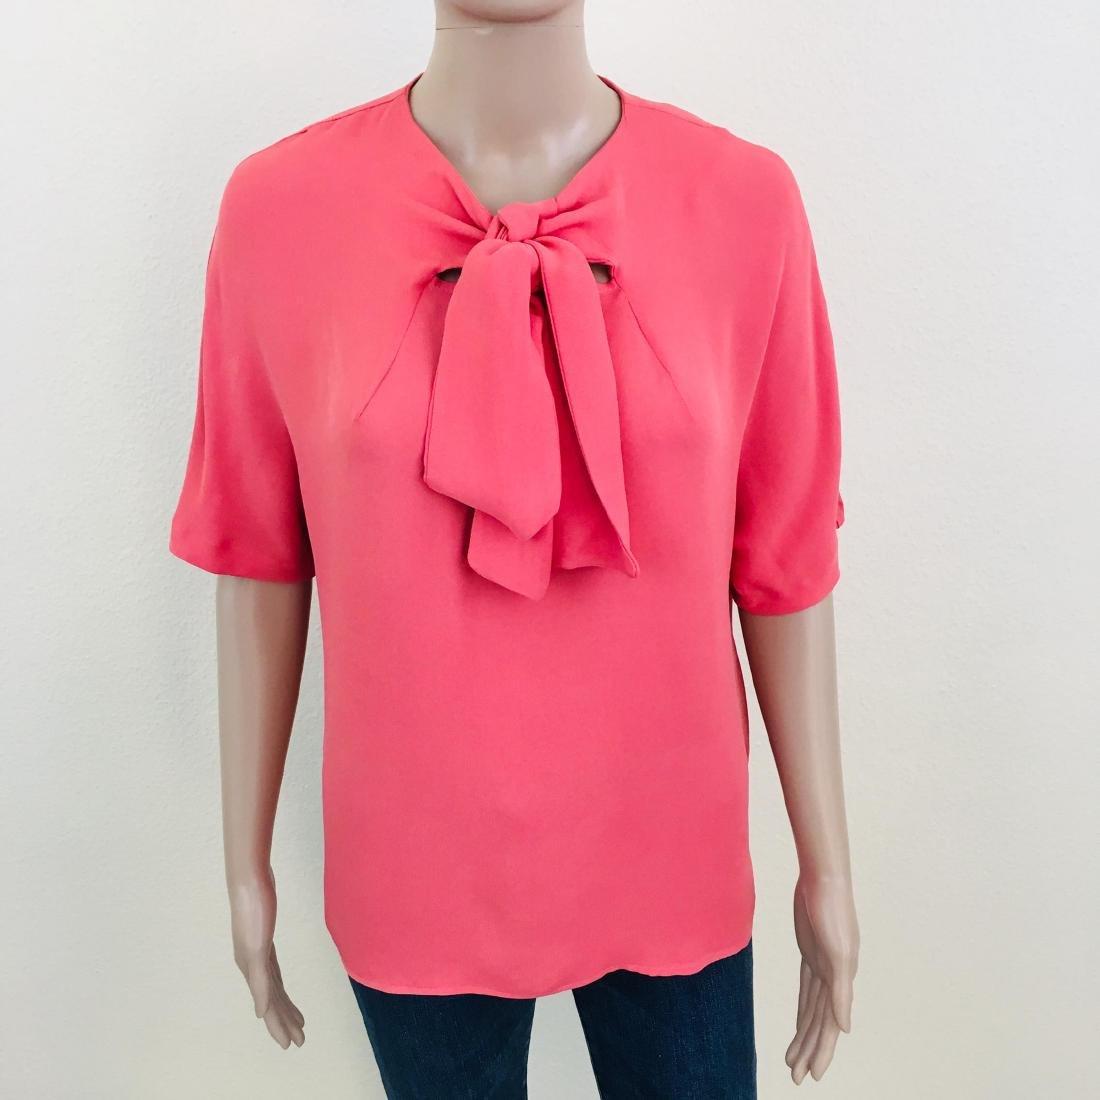 New Women's ZARA Top Blouse Size M - 4